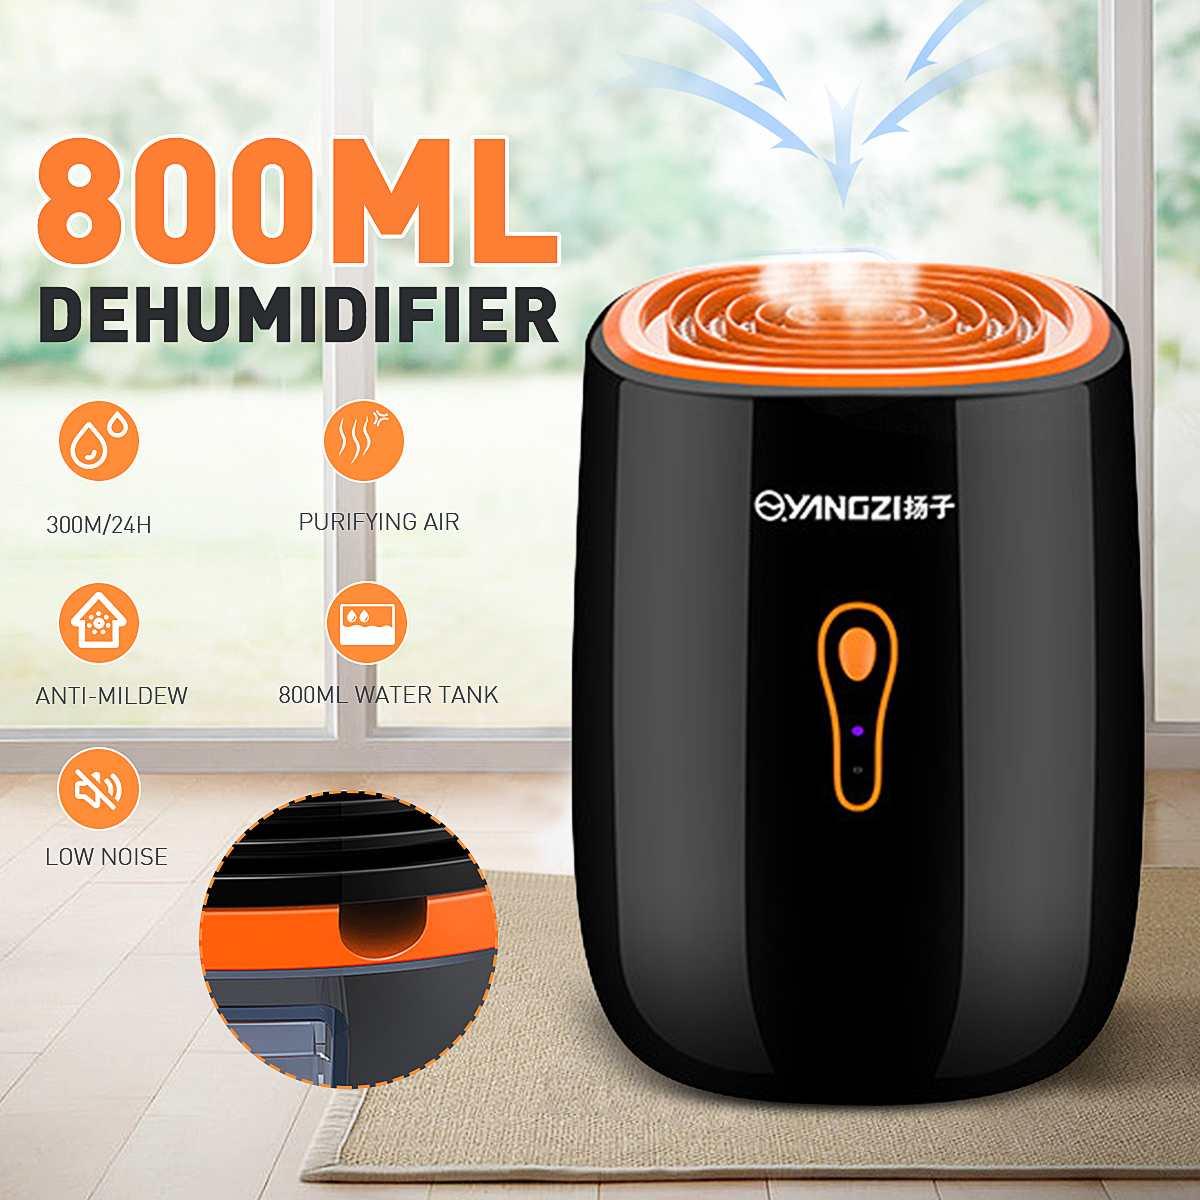 Becornce مزيل الرطوبة 800 مللي 25 واط منخفضة الضوضاء المحمولة مجفف مكافحة العفن تنقية المحمولة تنظيف جهاز مجفف هواء الرطوبة